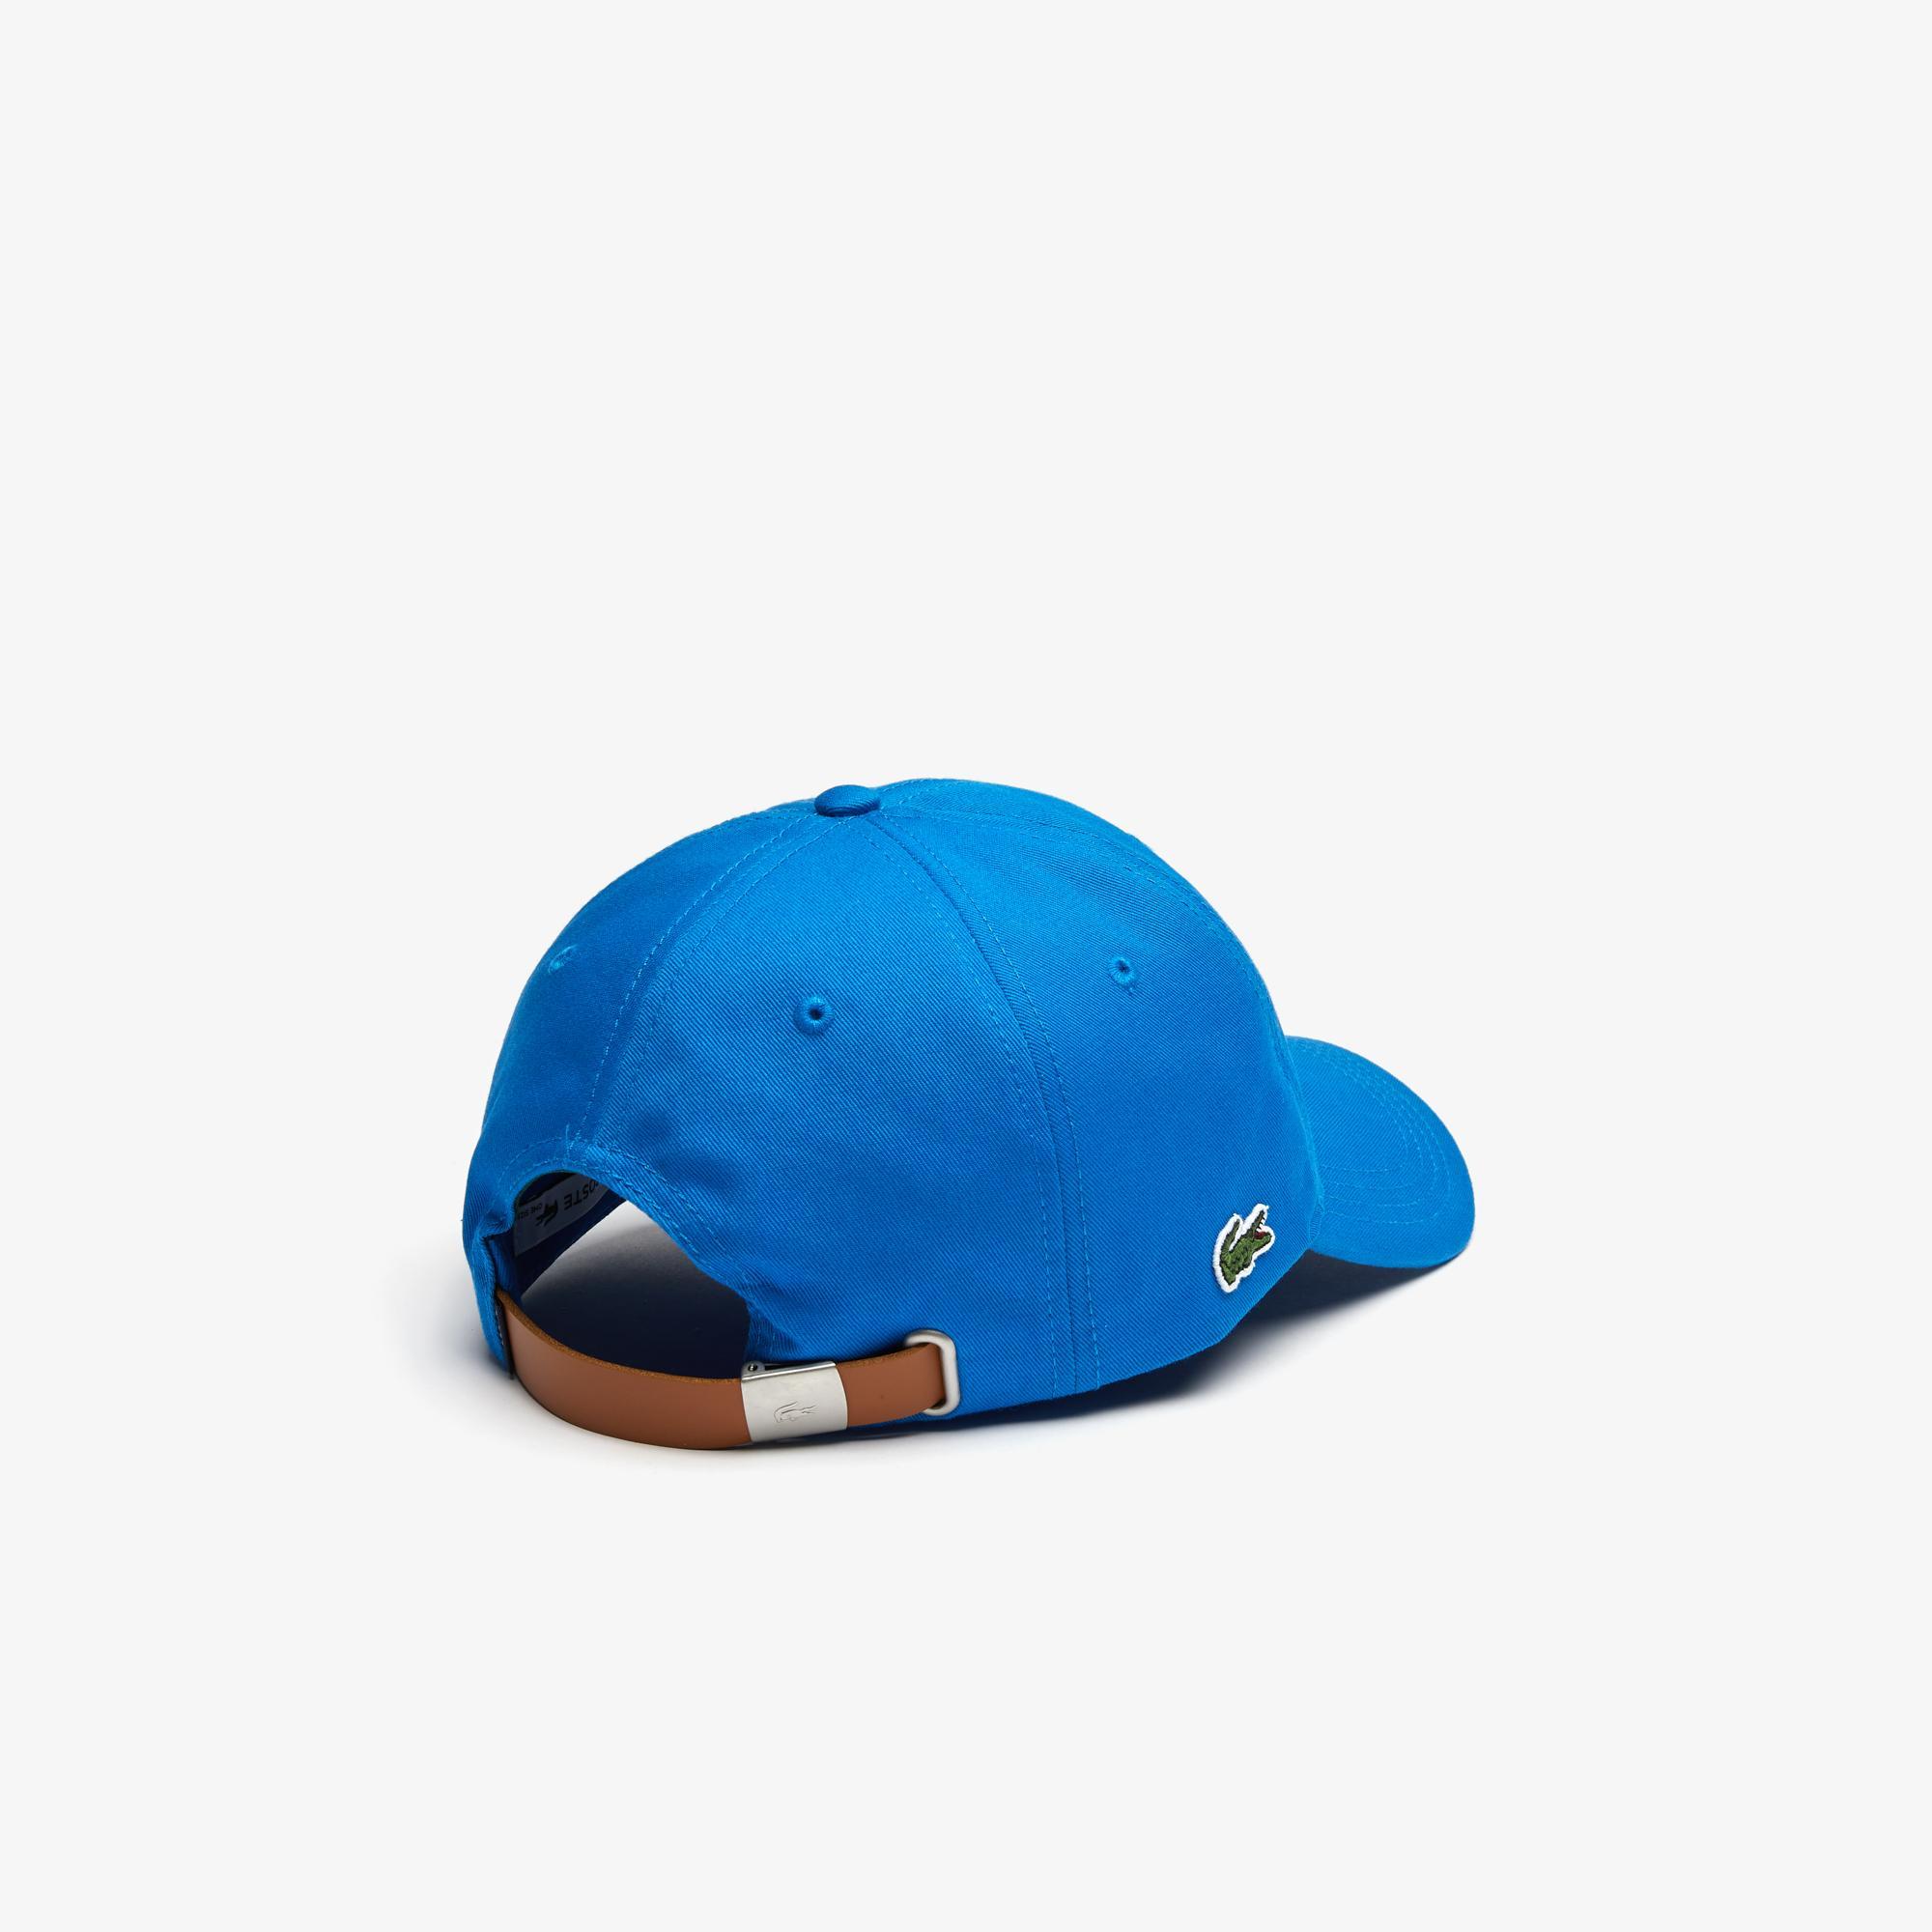 Lacoste Unisex Mavi Şapka